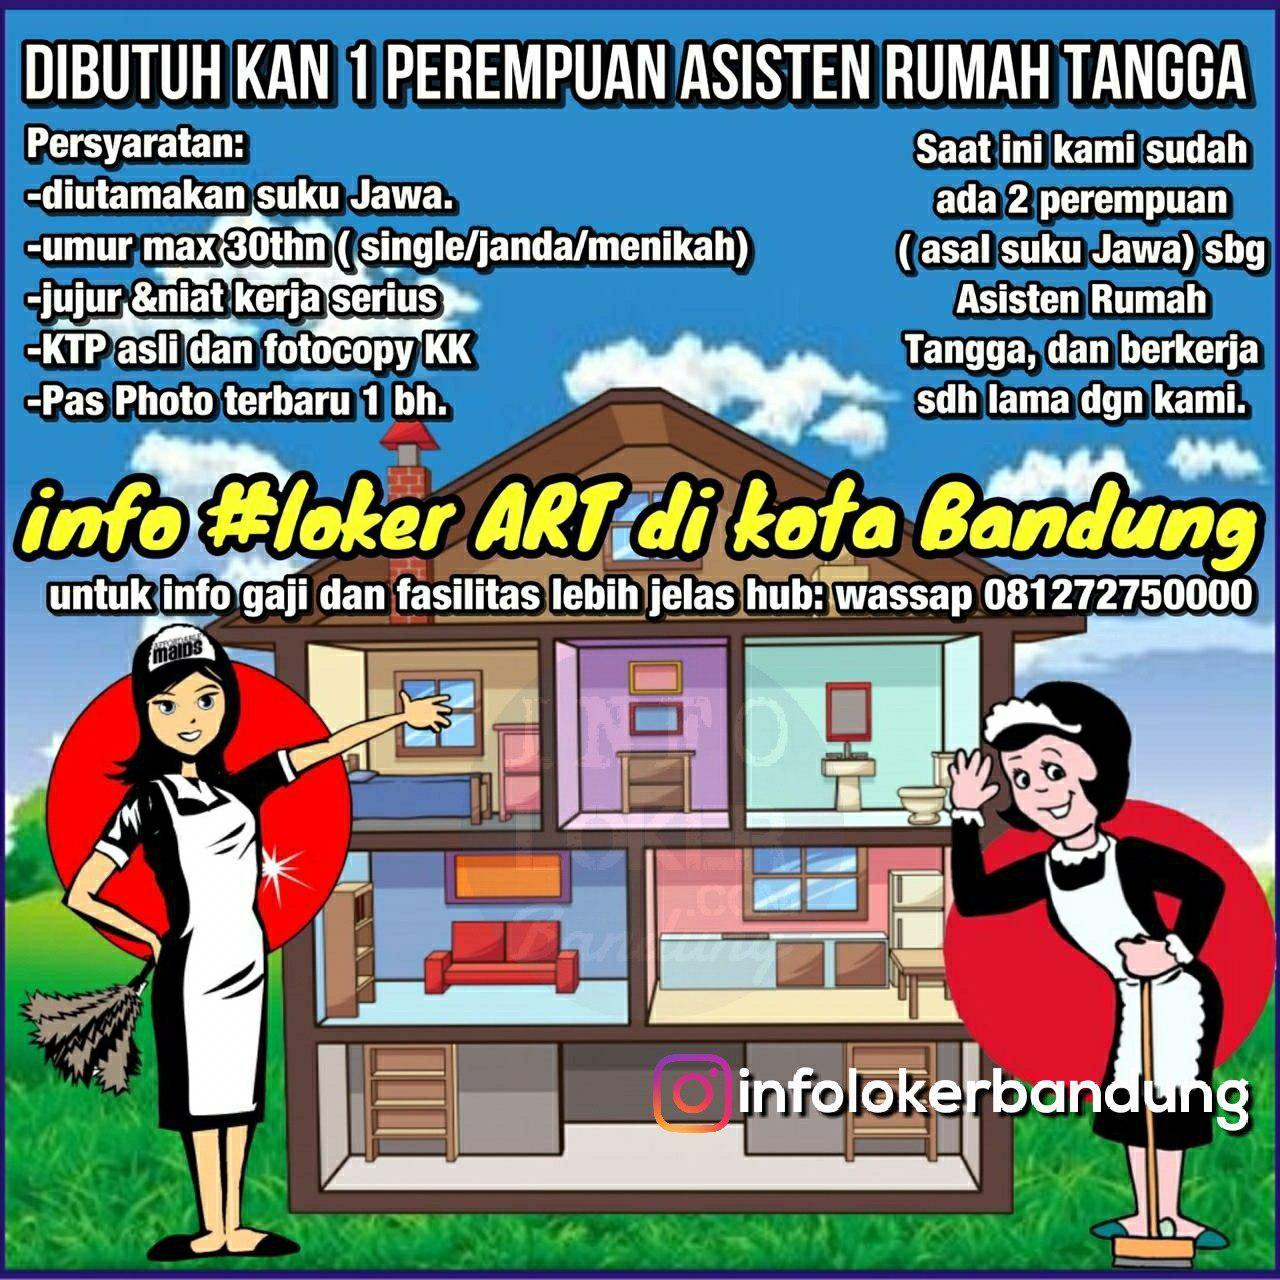 Lowongan Kerja Asisten Rumah Tangga Bandung September 2018